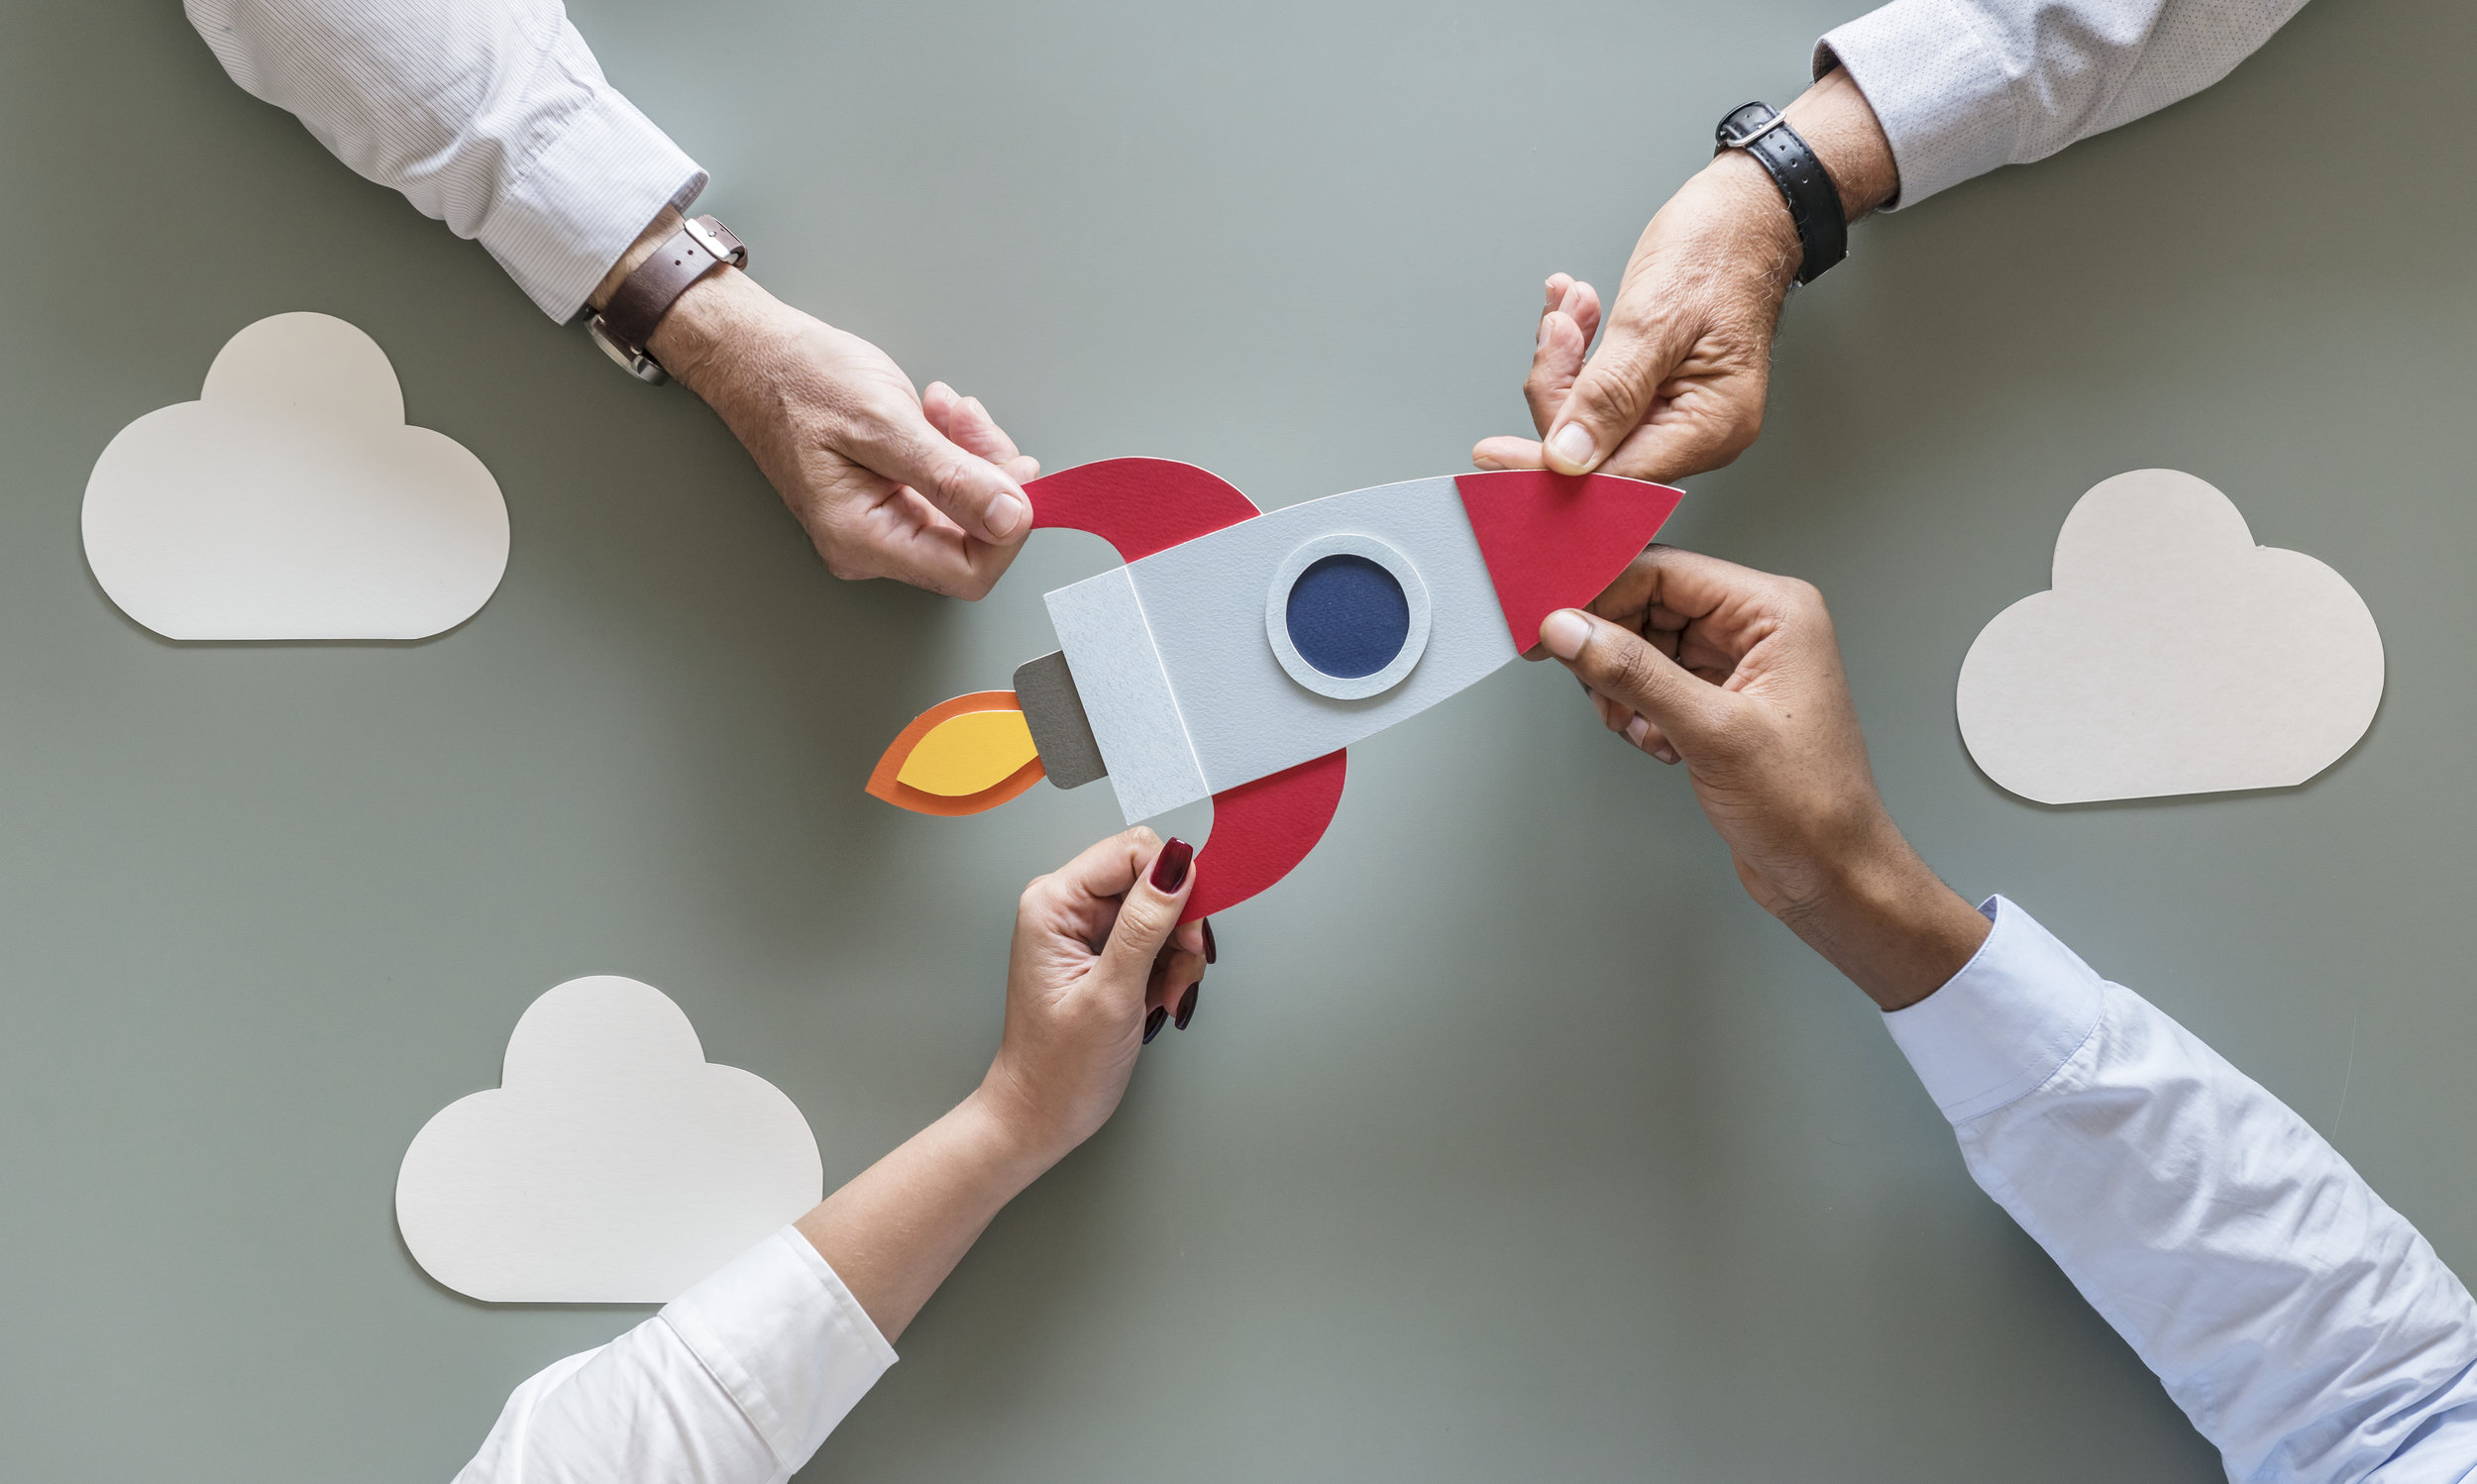 business-people-with-startup-rocket-PX3KCVA.jpg